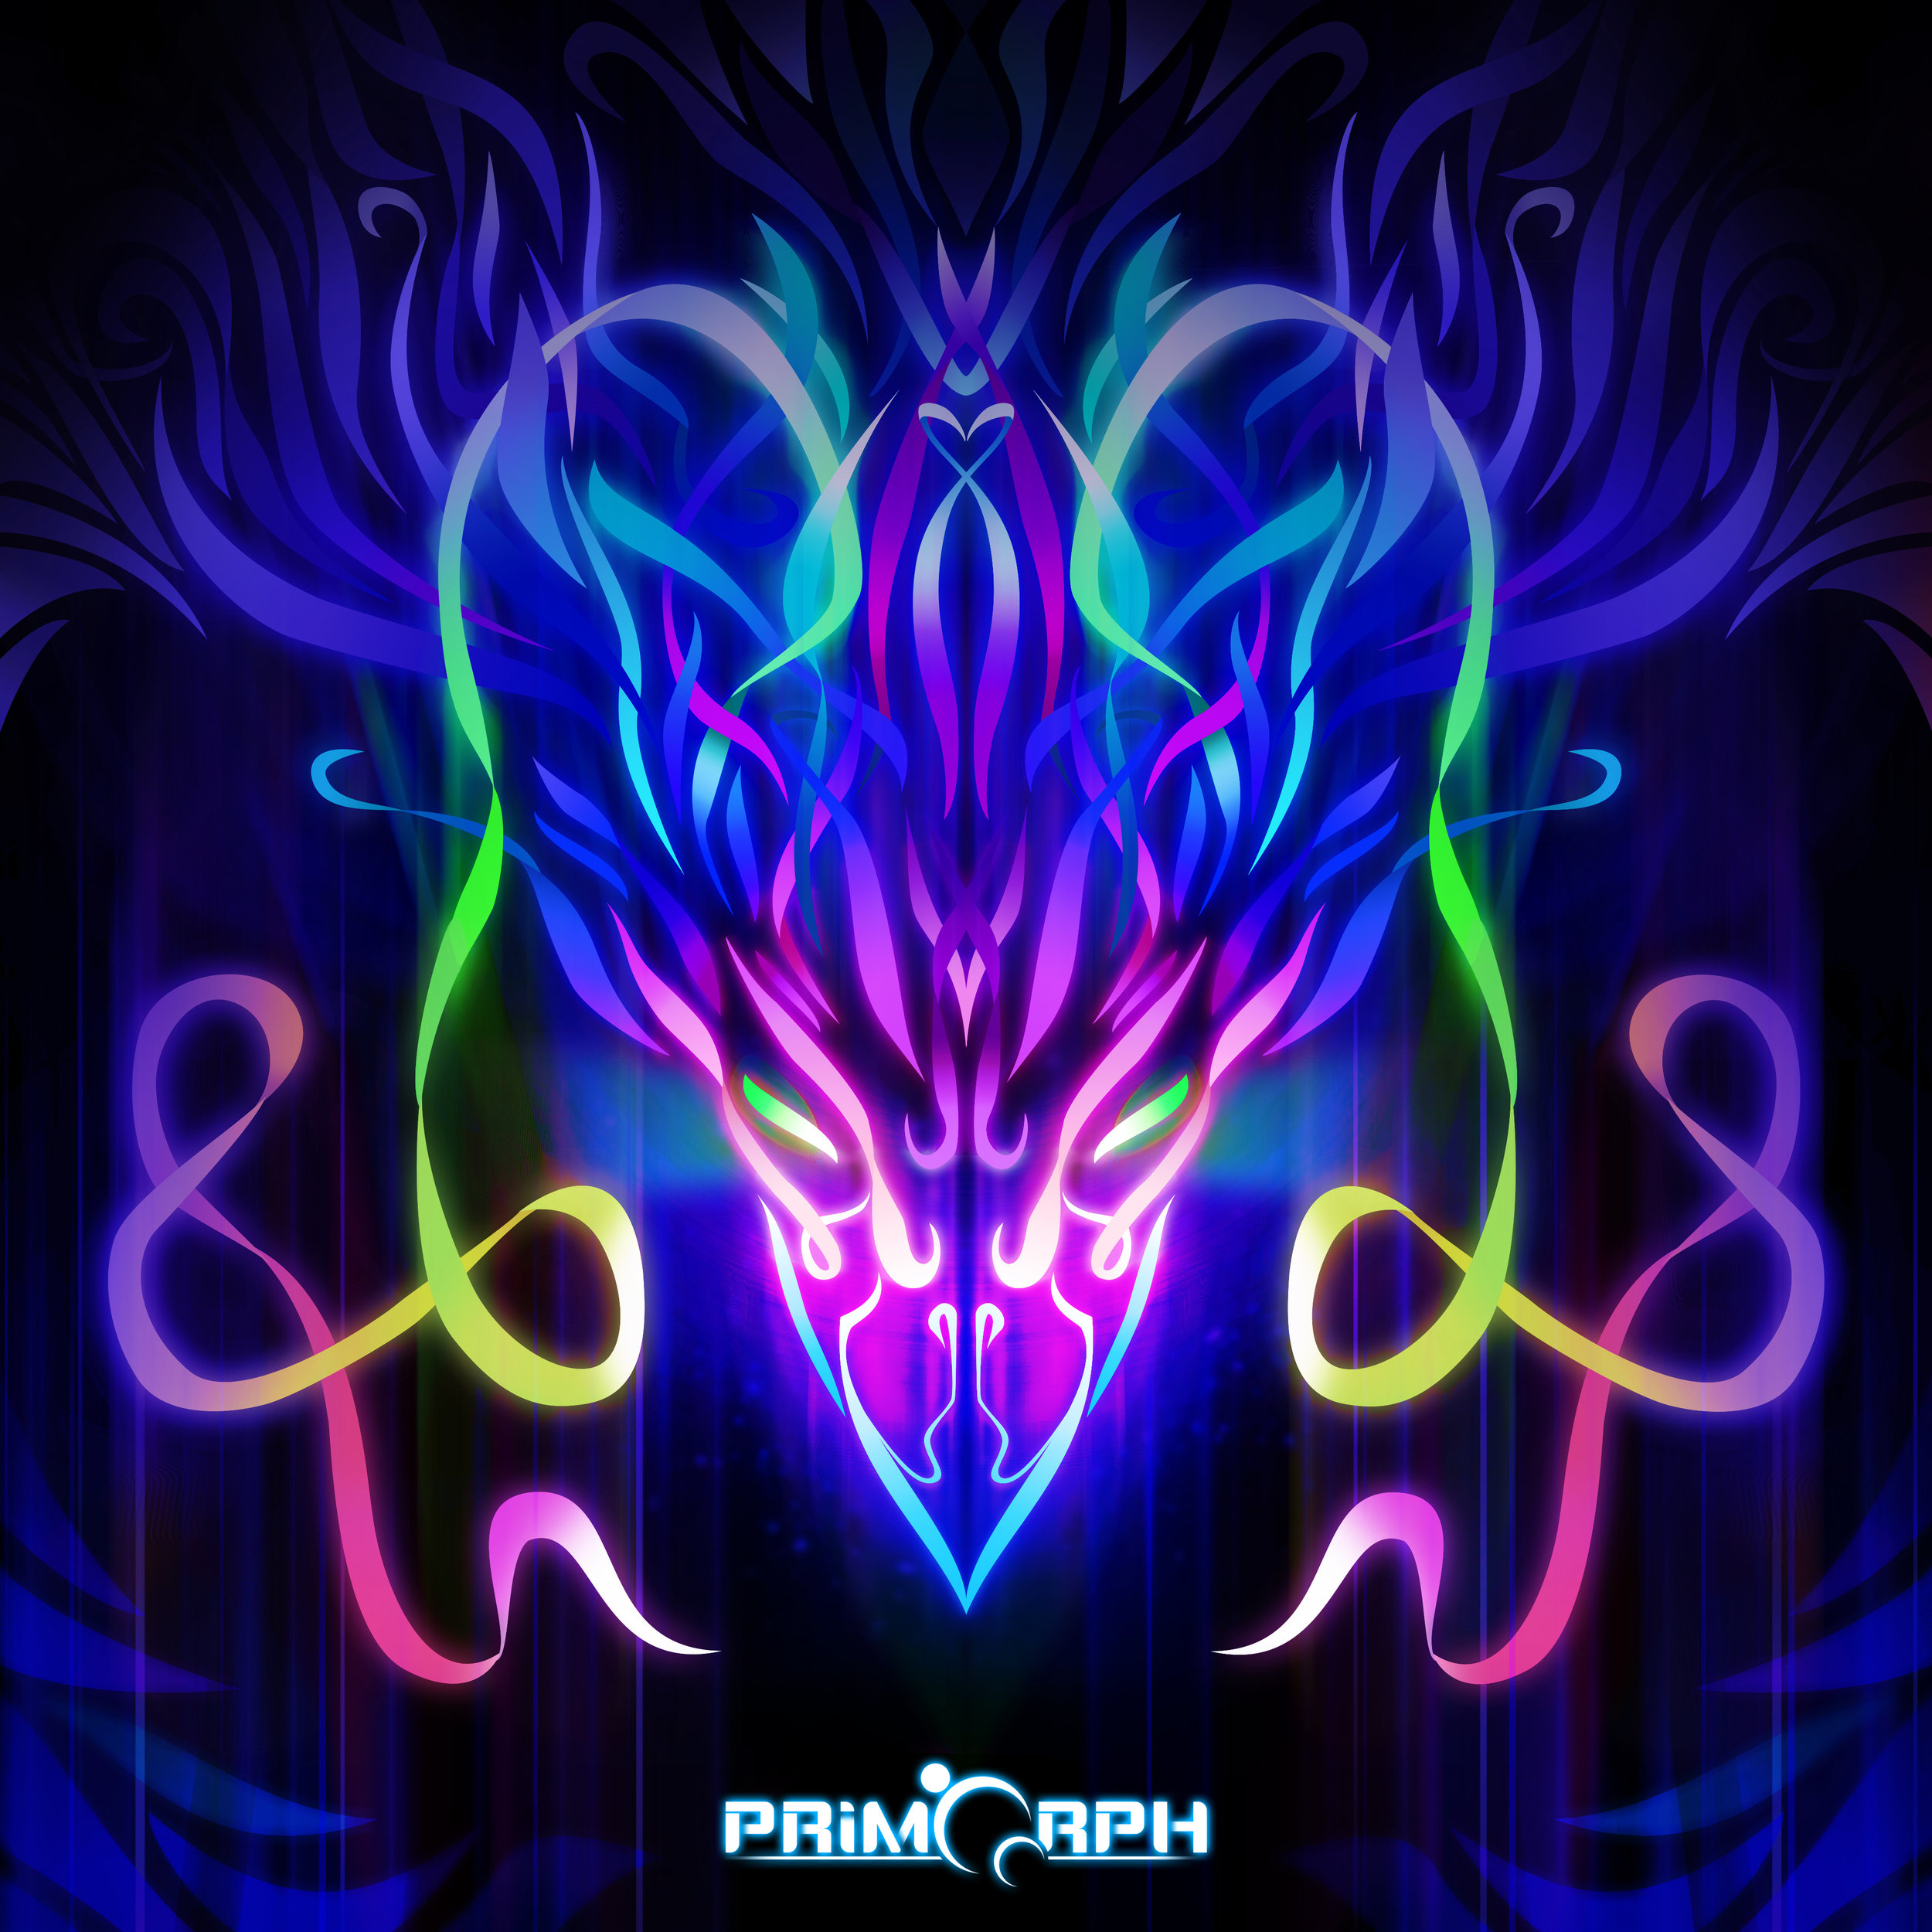 Primorph Album Master.jpg